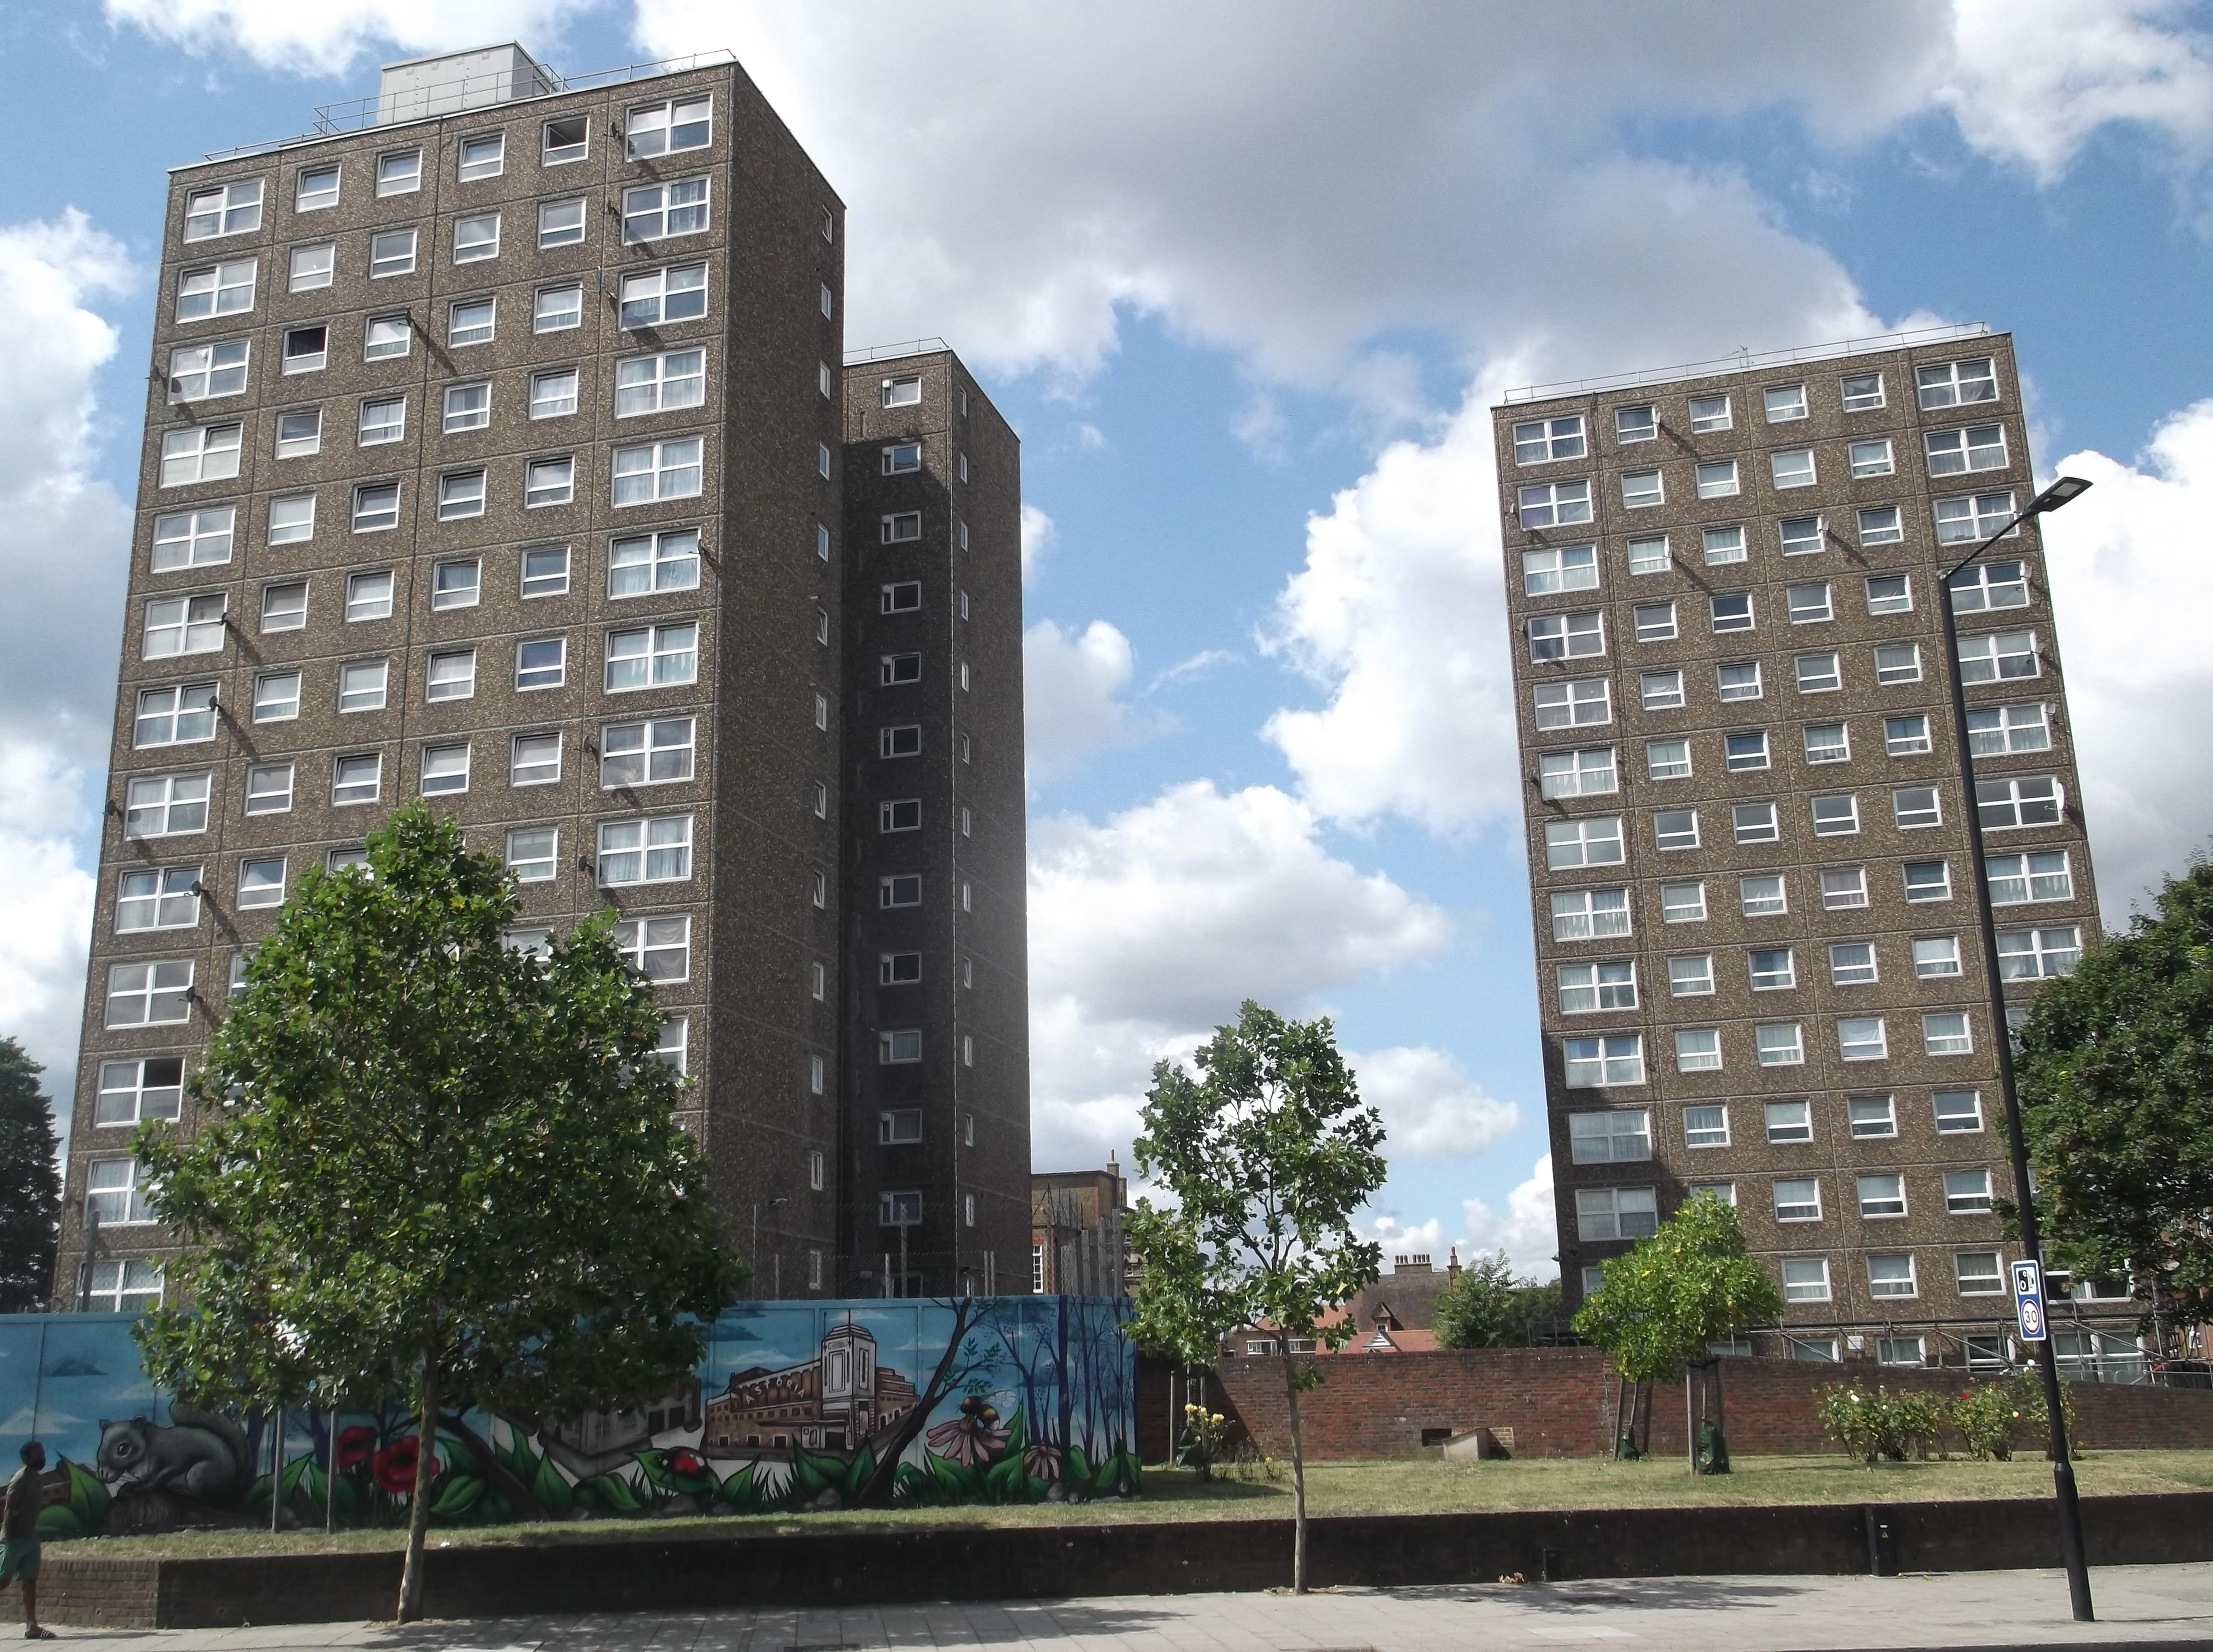 Ledbury Estate August 2020